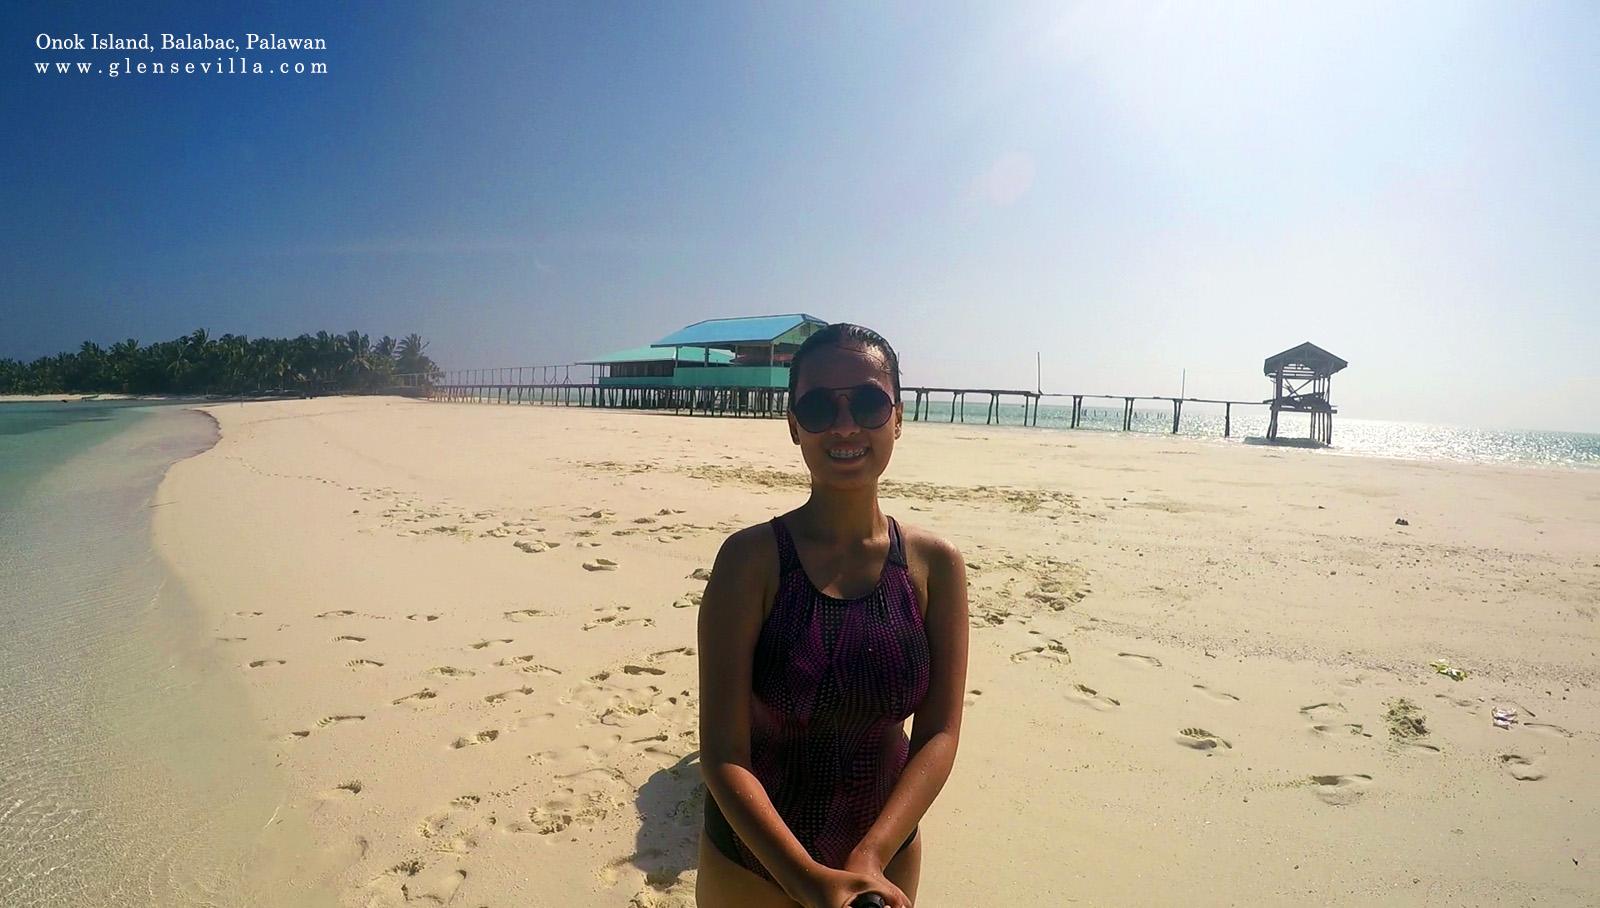 Onok Island, Balabac, Palawan, beach